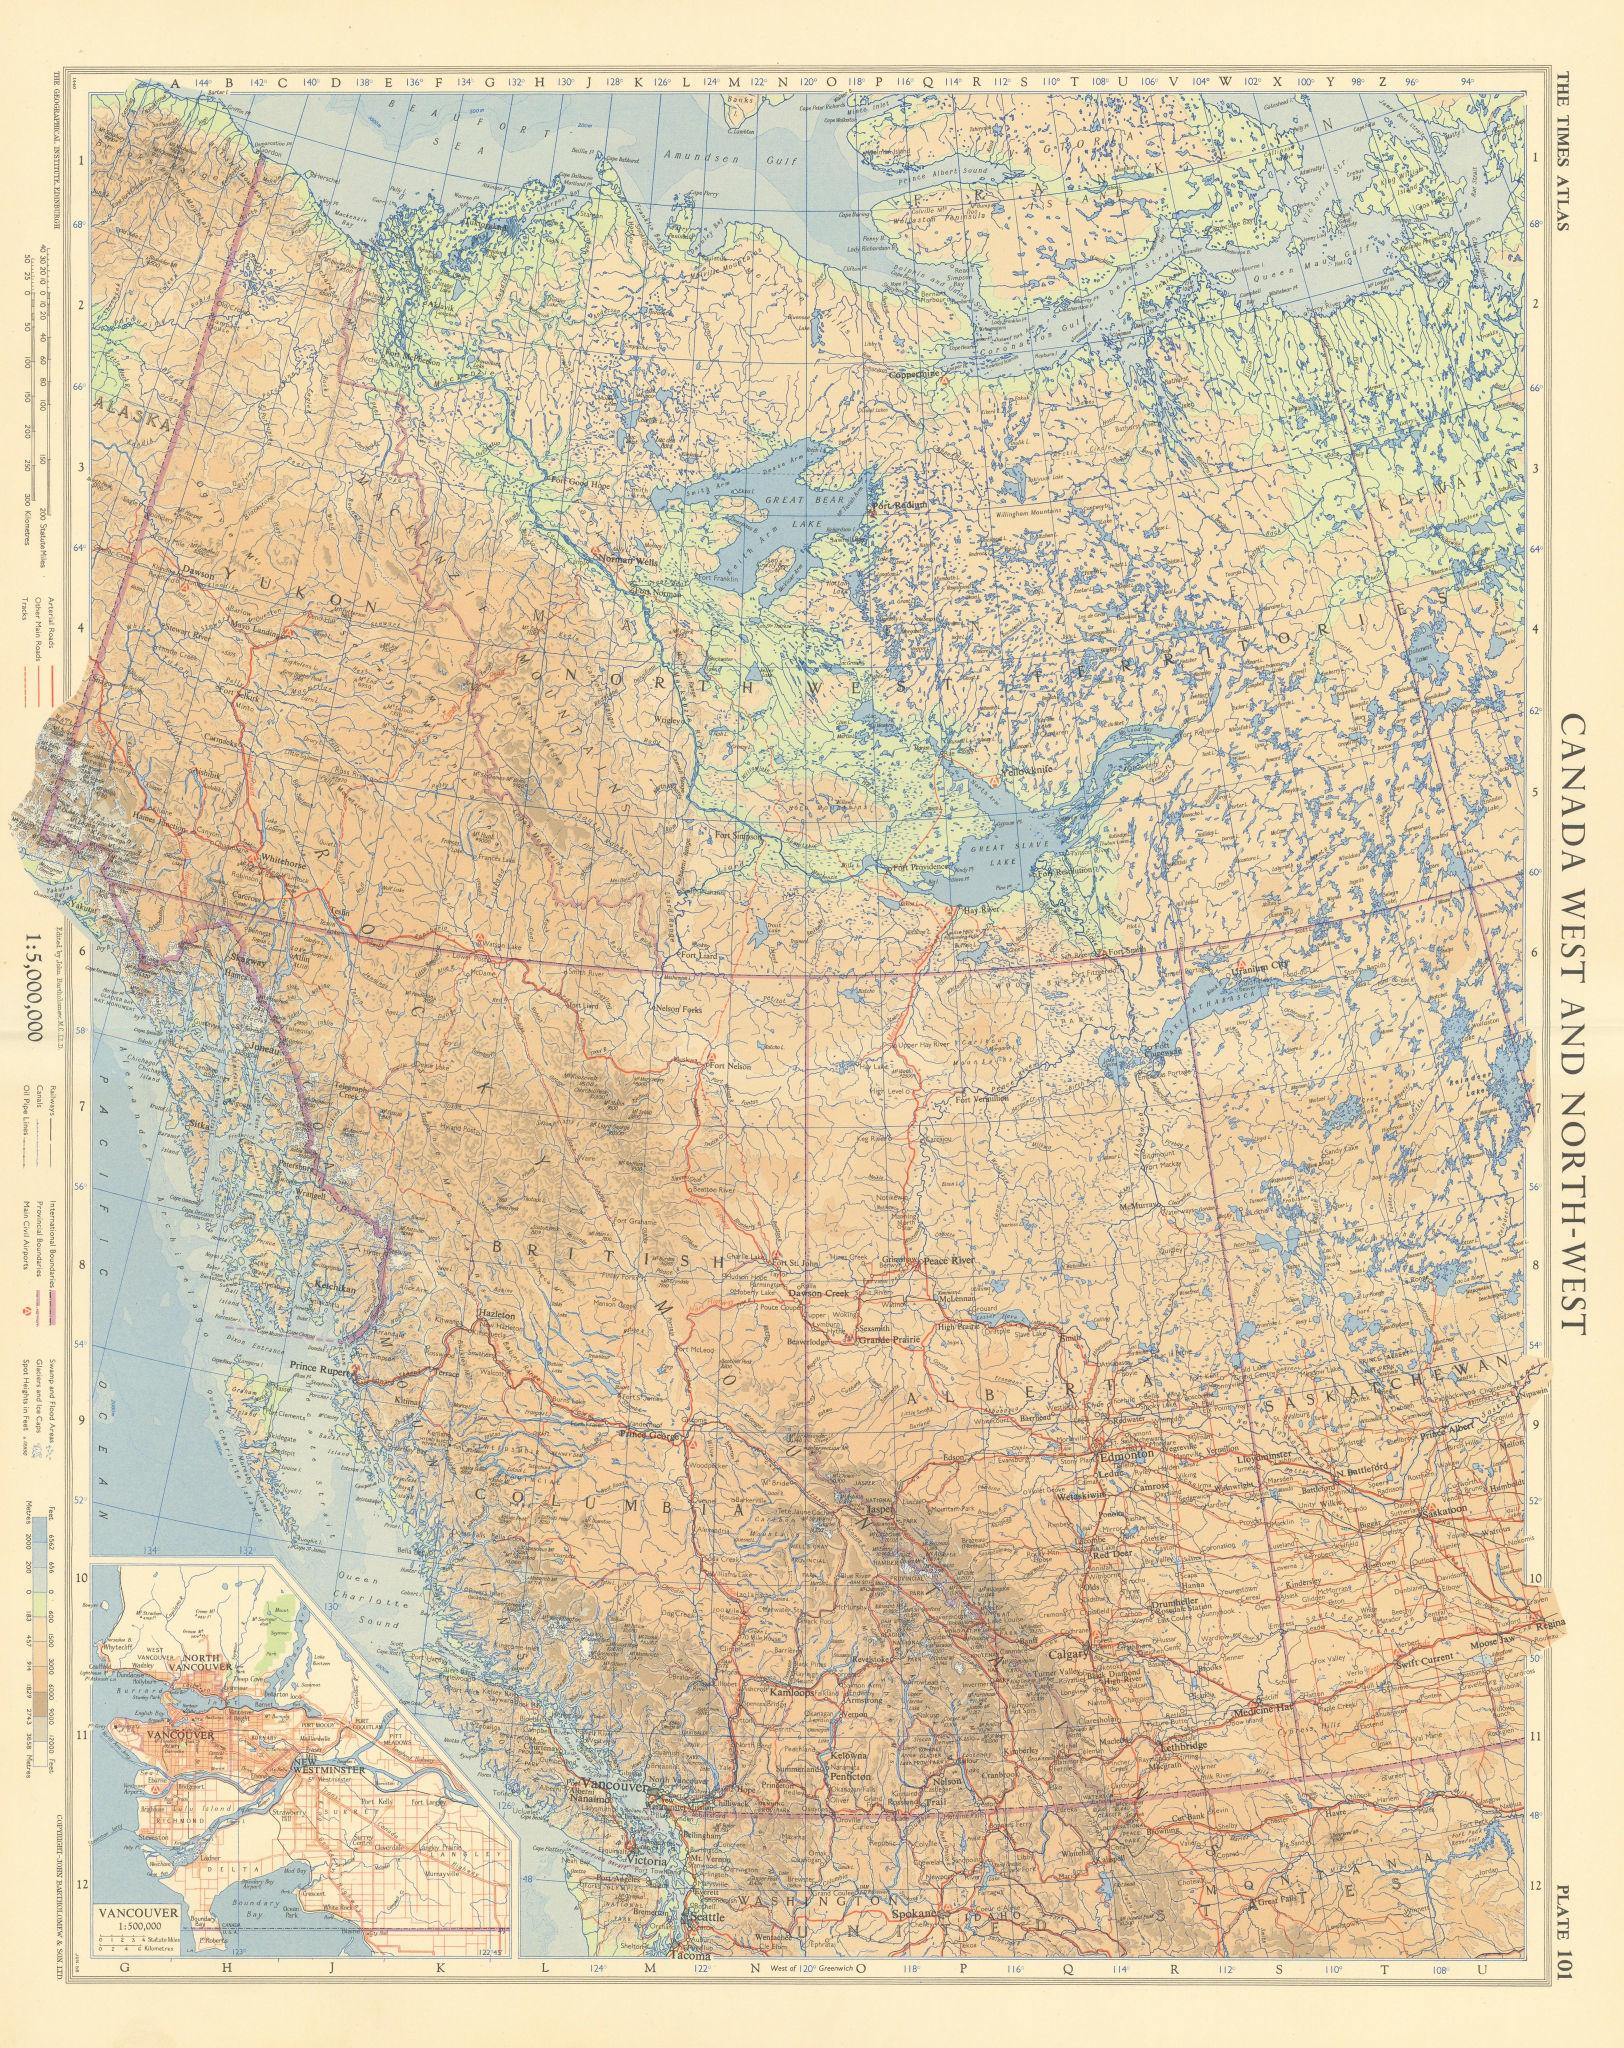 Canada west. Vancouver British Columbia Alberta Yukon. TIMES 1957 old map